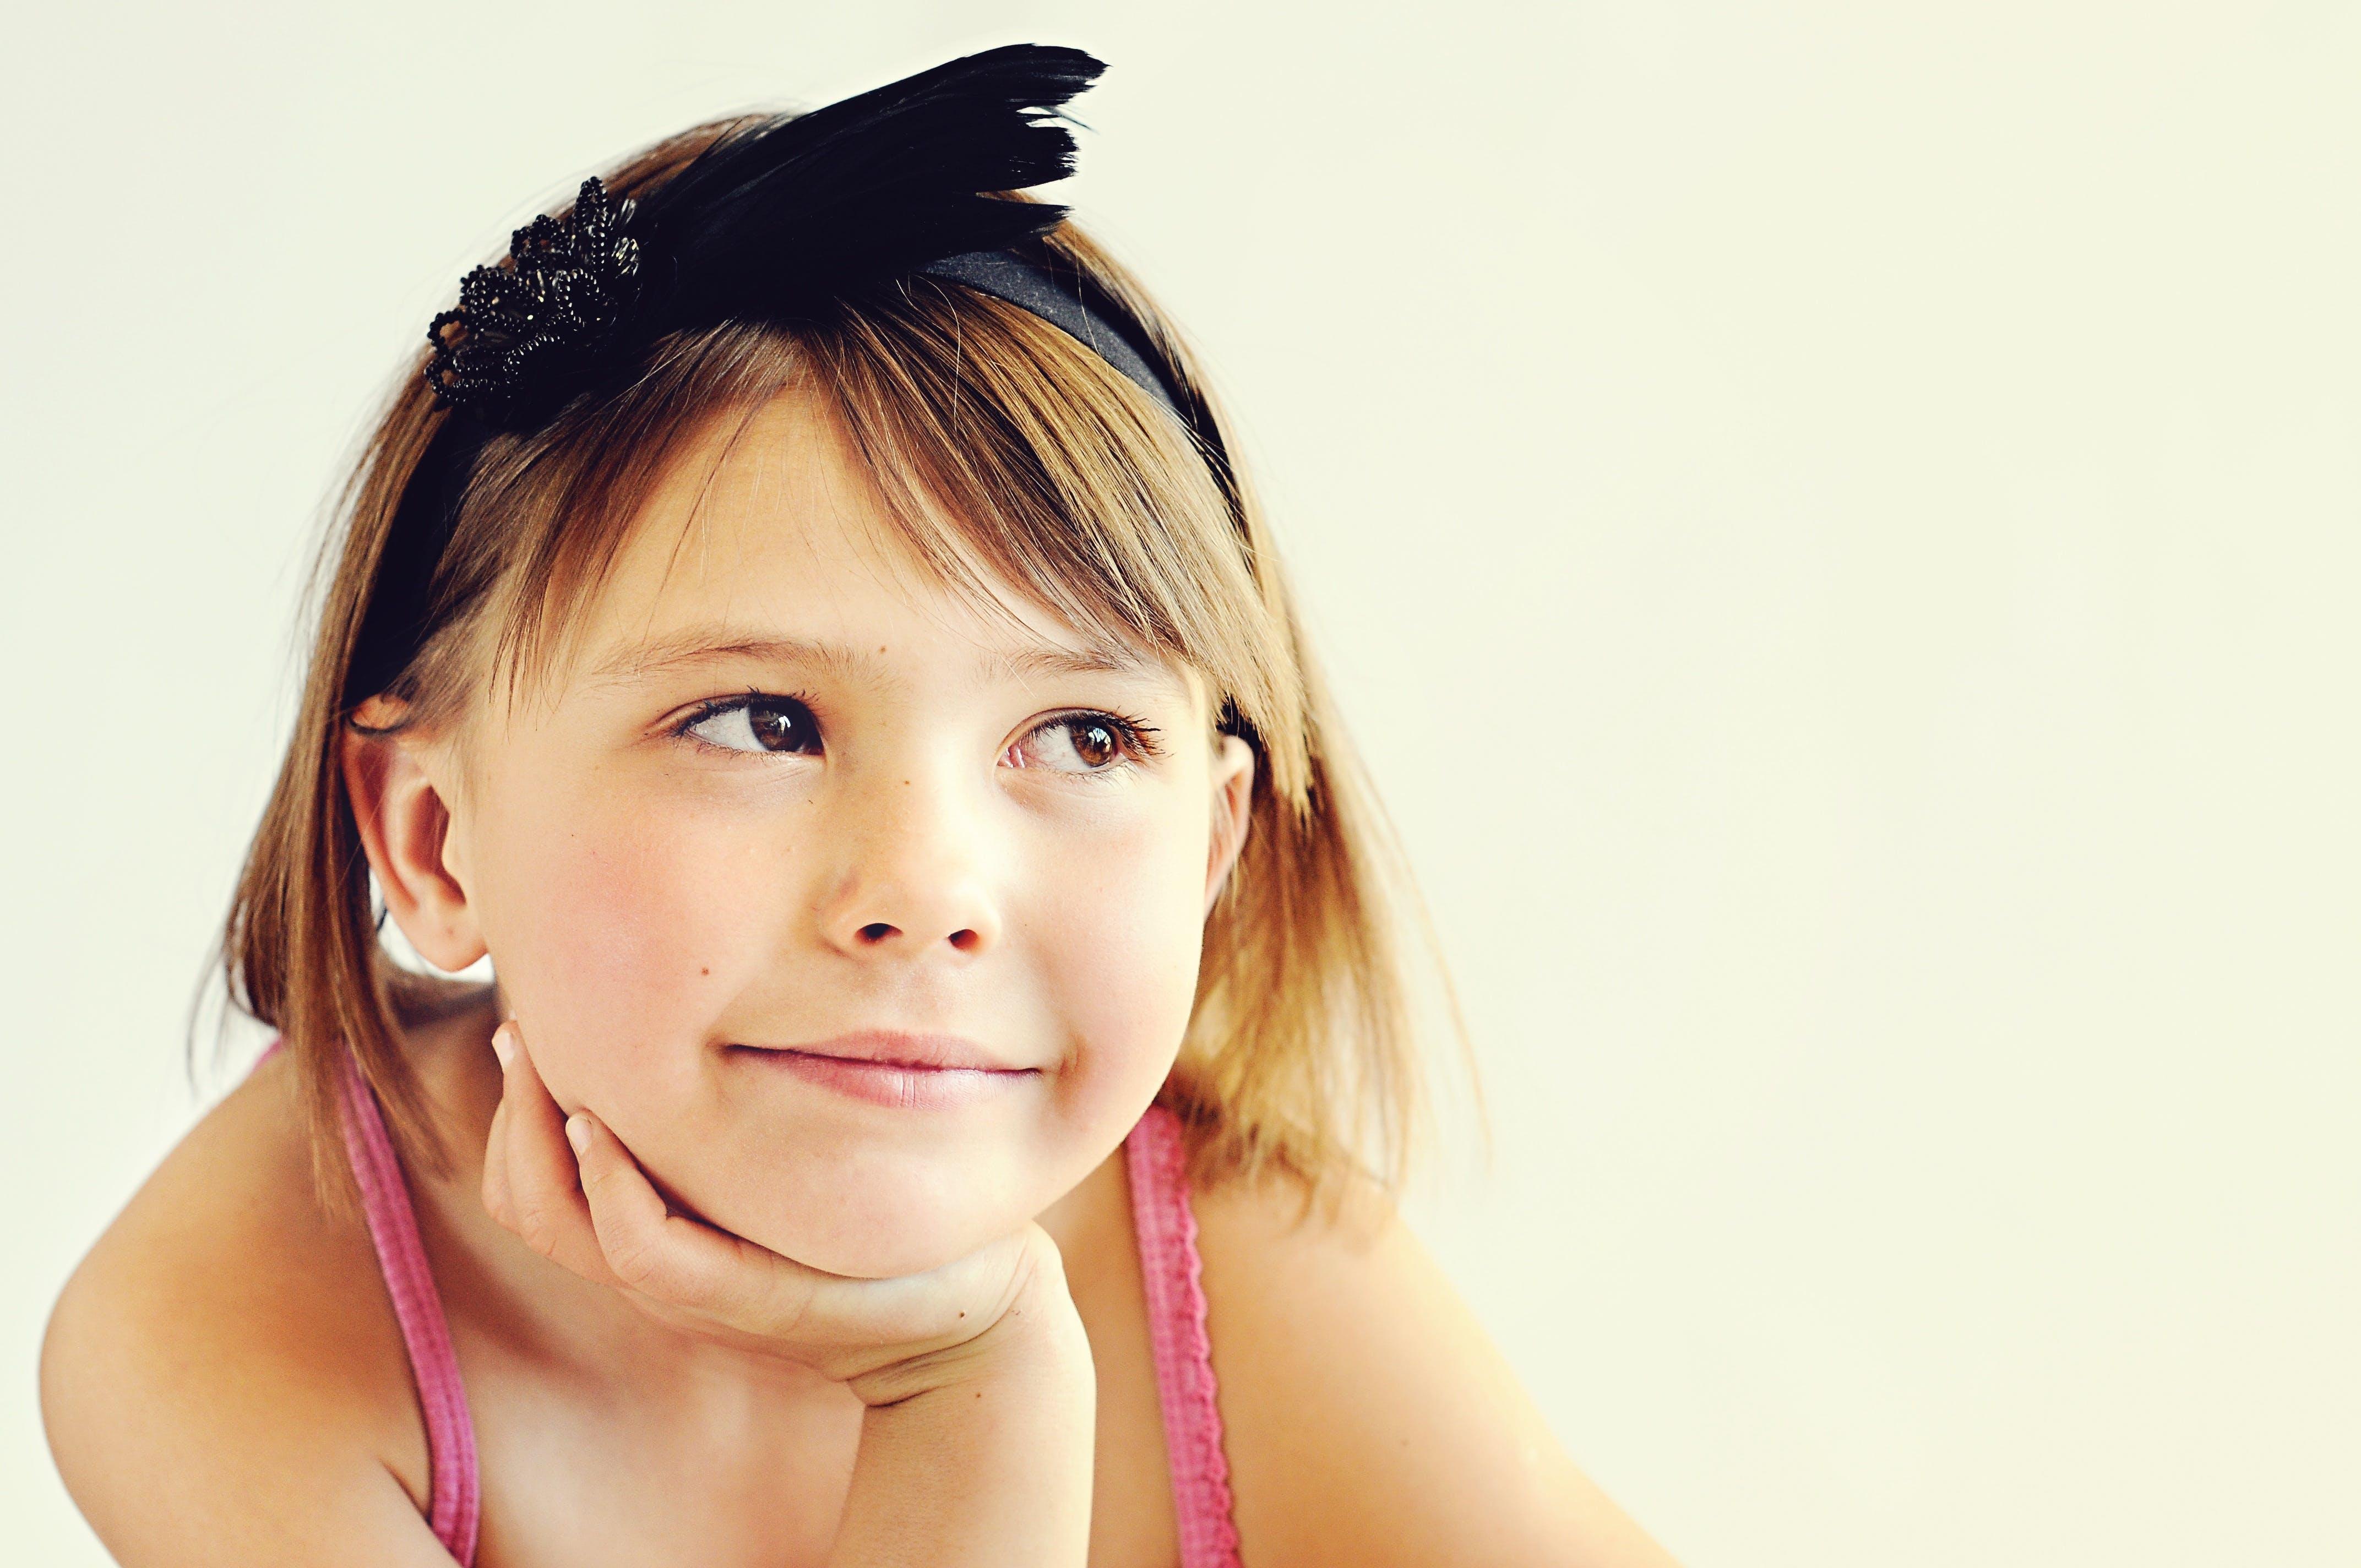 Free stock photo of girl, child, kid, parent